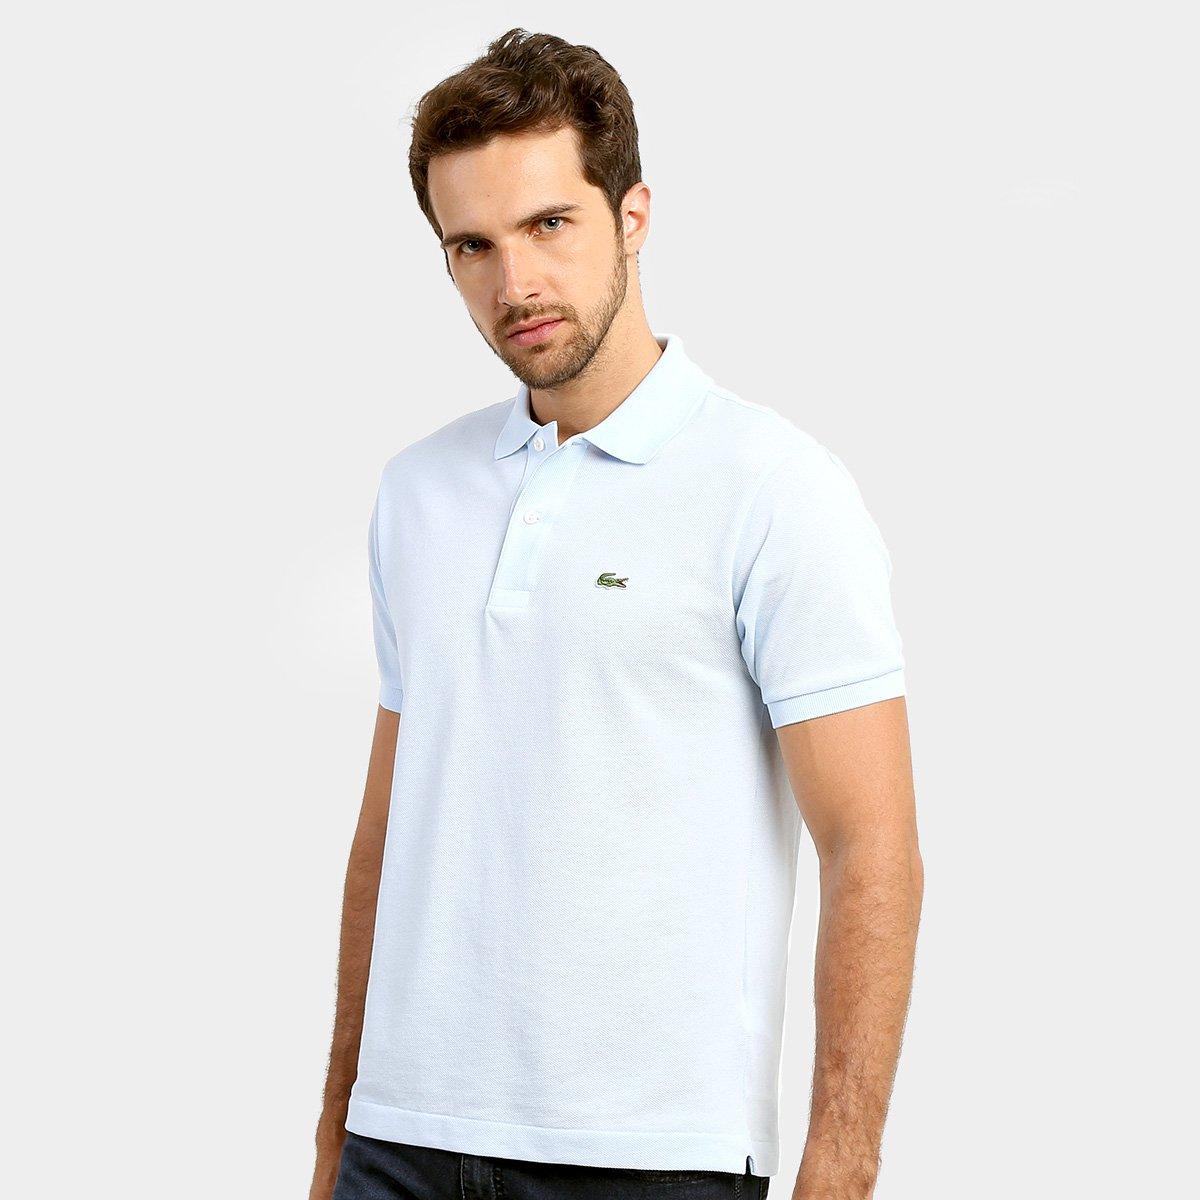 Camisa Polo Lacoste Original Fit Masculina 9e04cd39bb